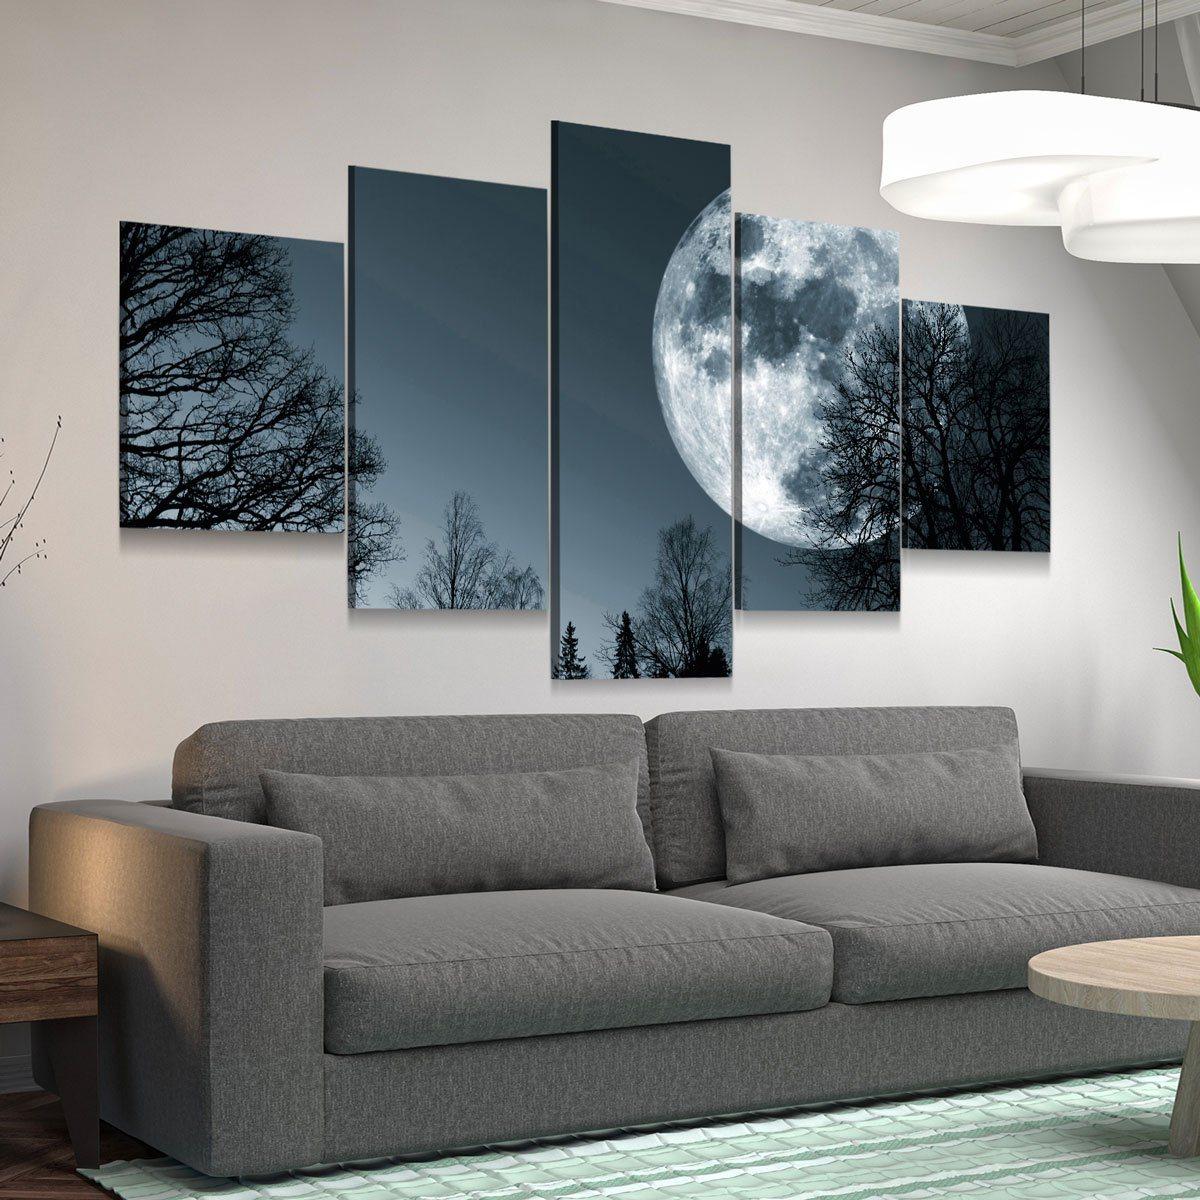 Super Moon 5 panel canvas wall art